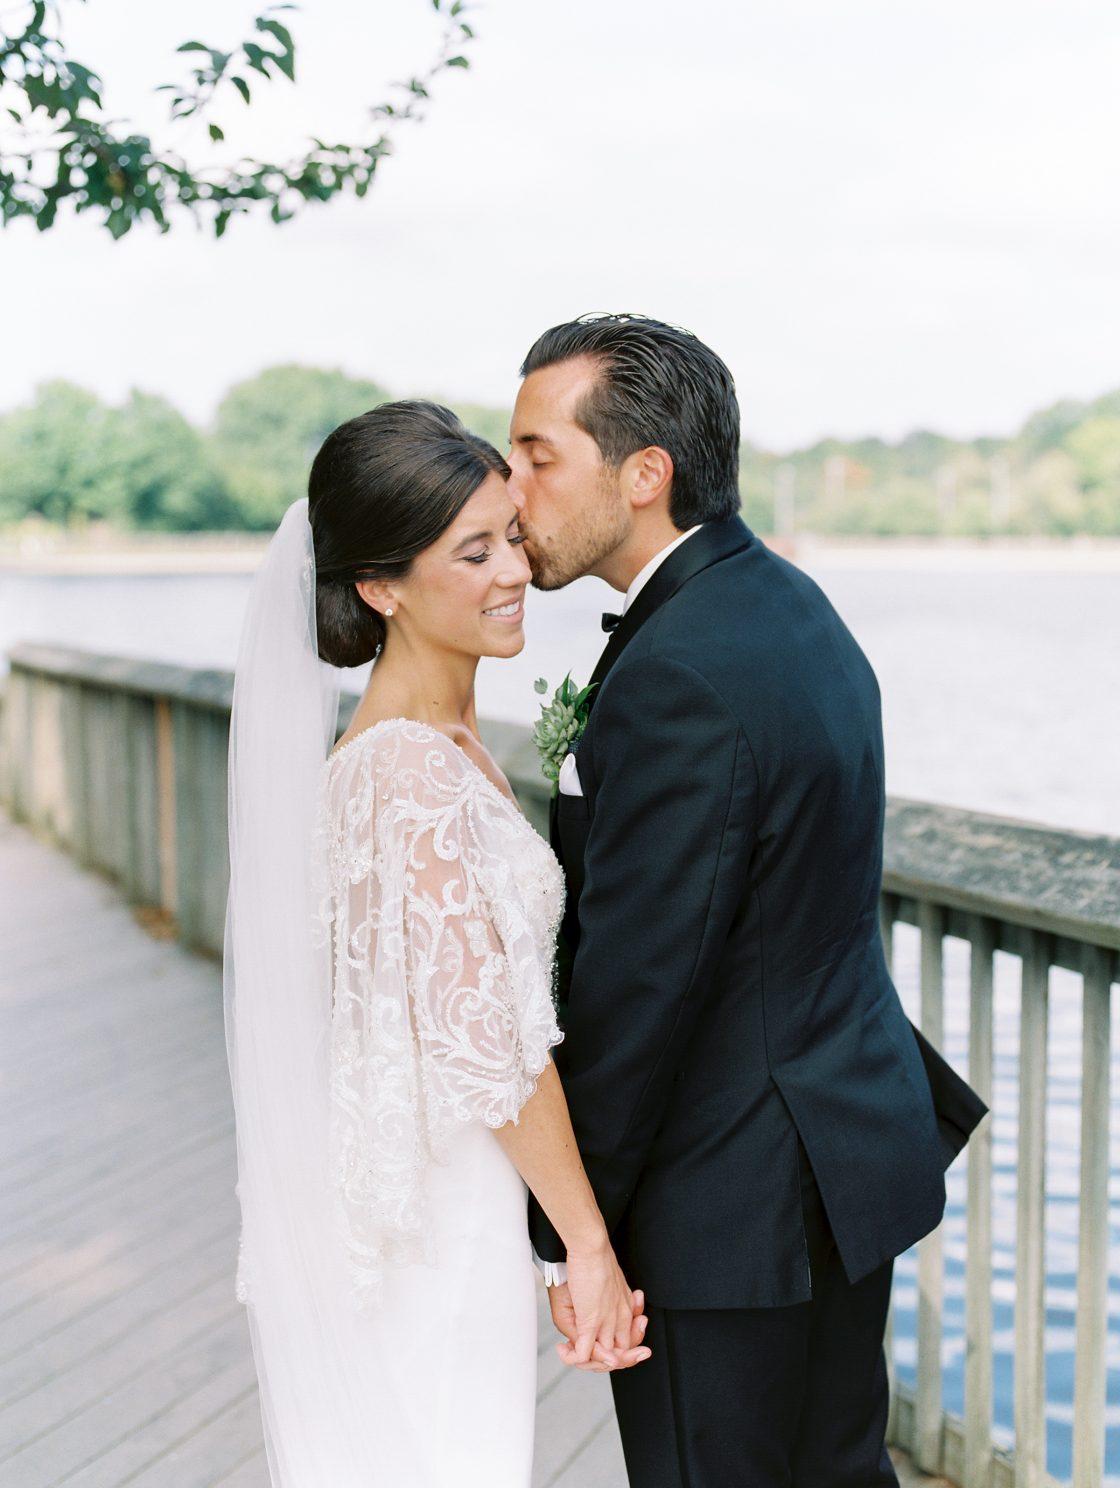 Elegant New Jersey Wedding with Greenery 81